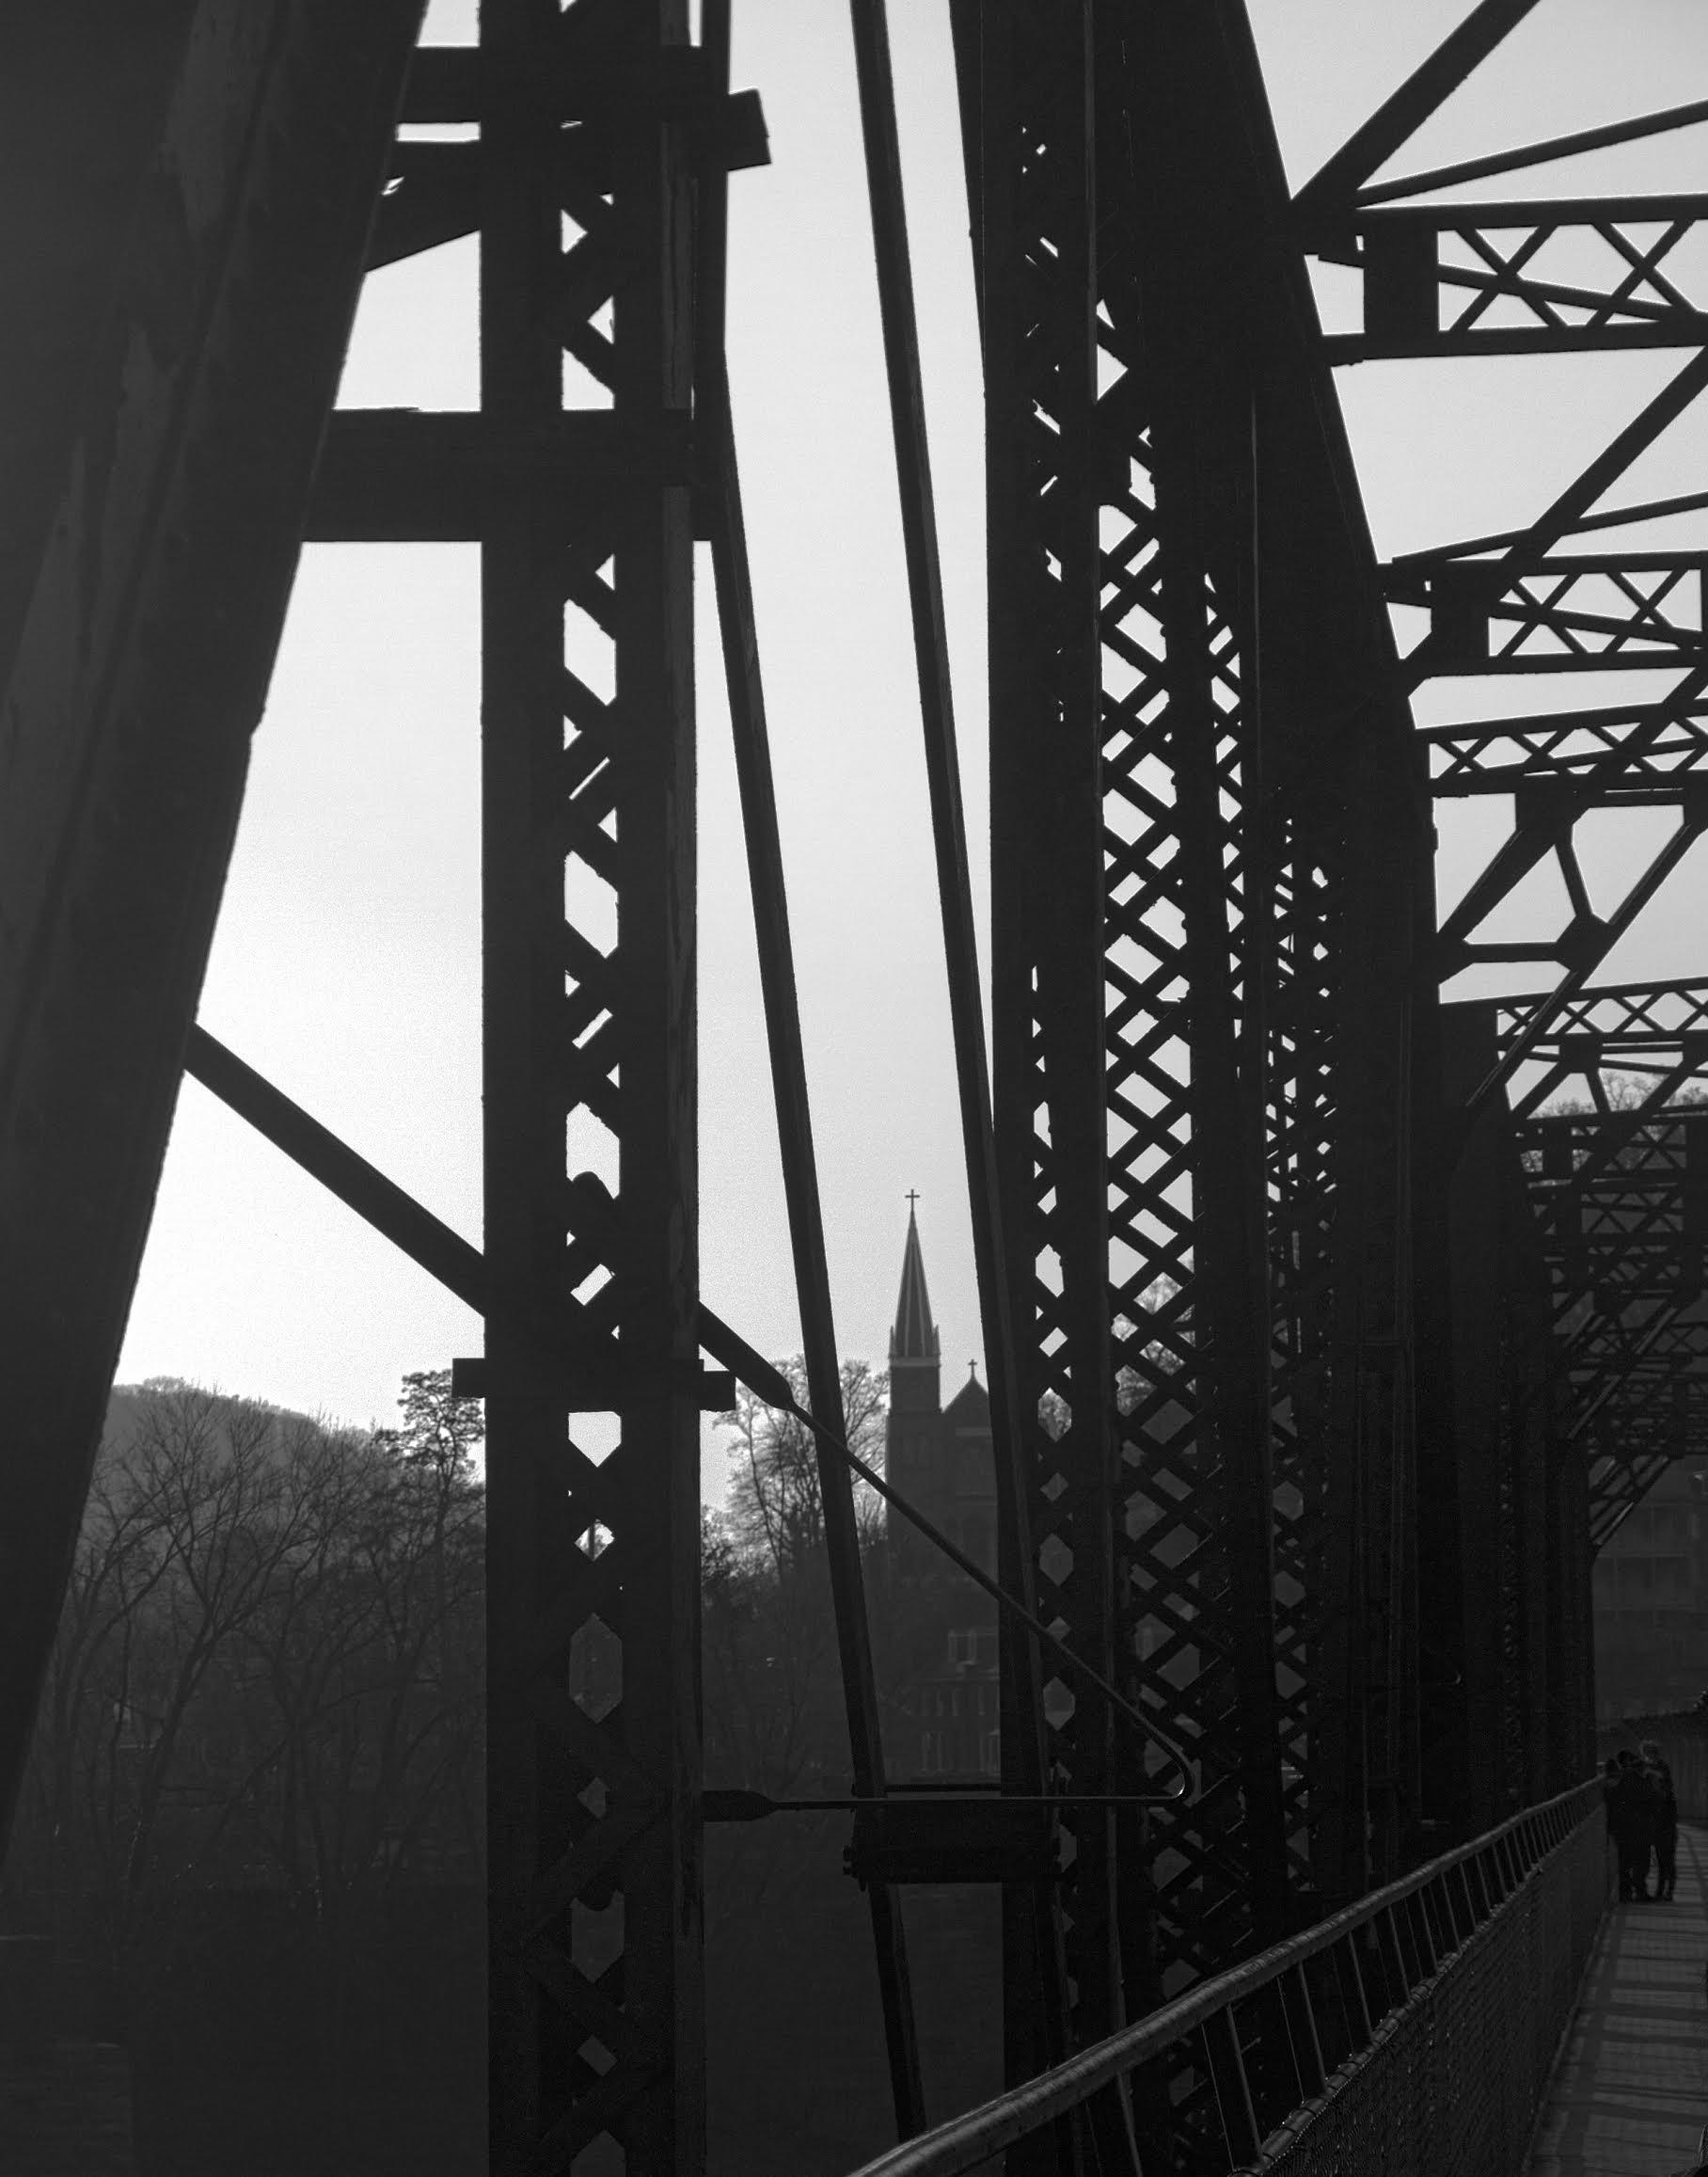 D. Pumplin, Pumplin, Harpers Ferry Bridge